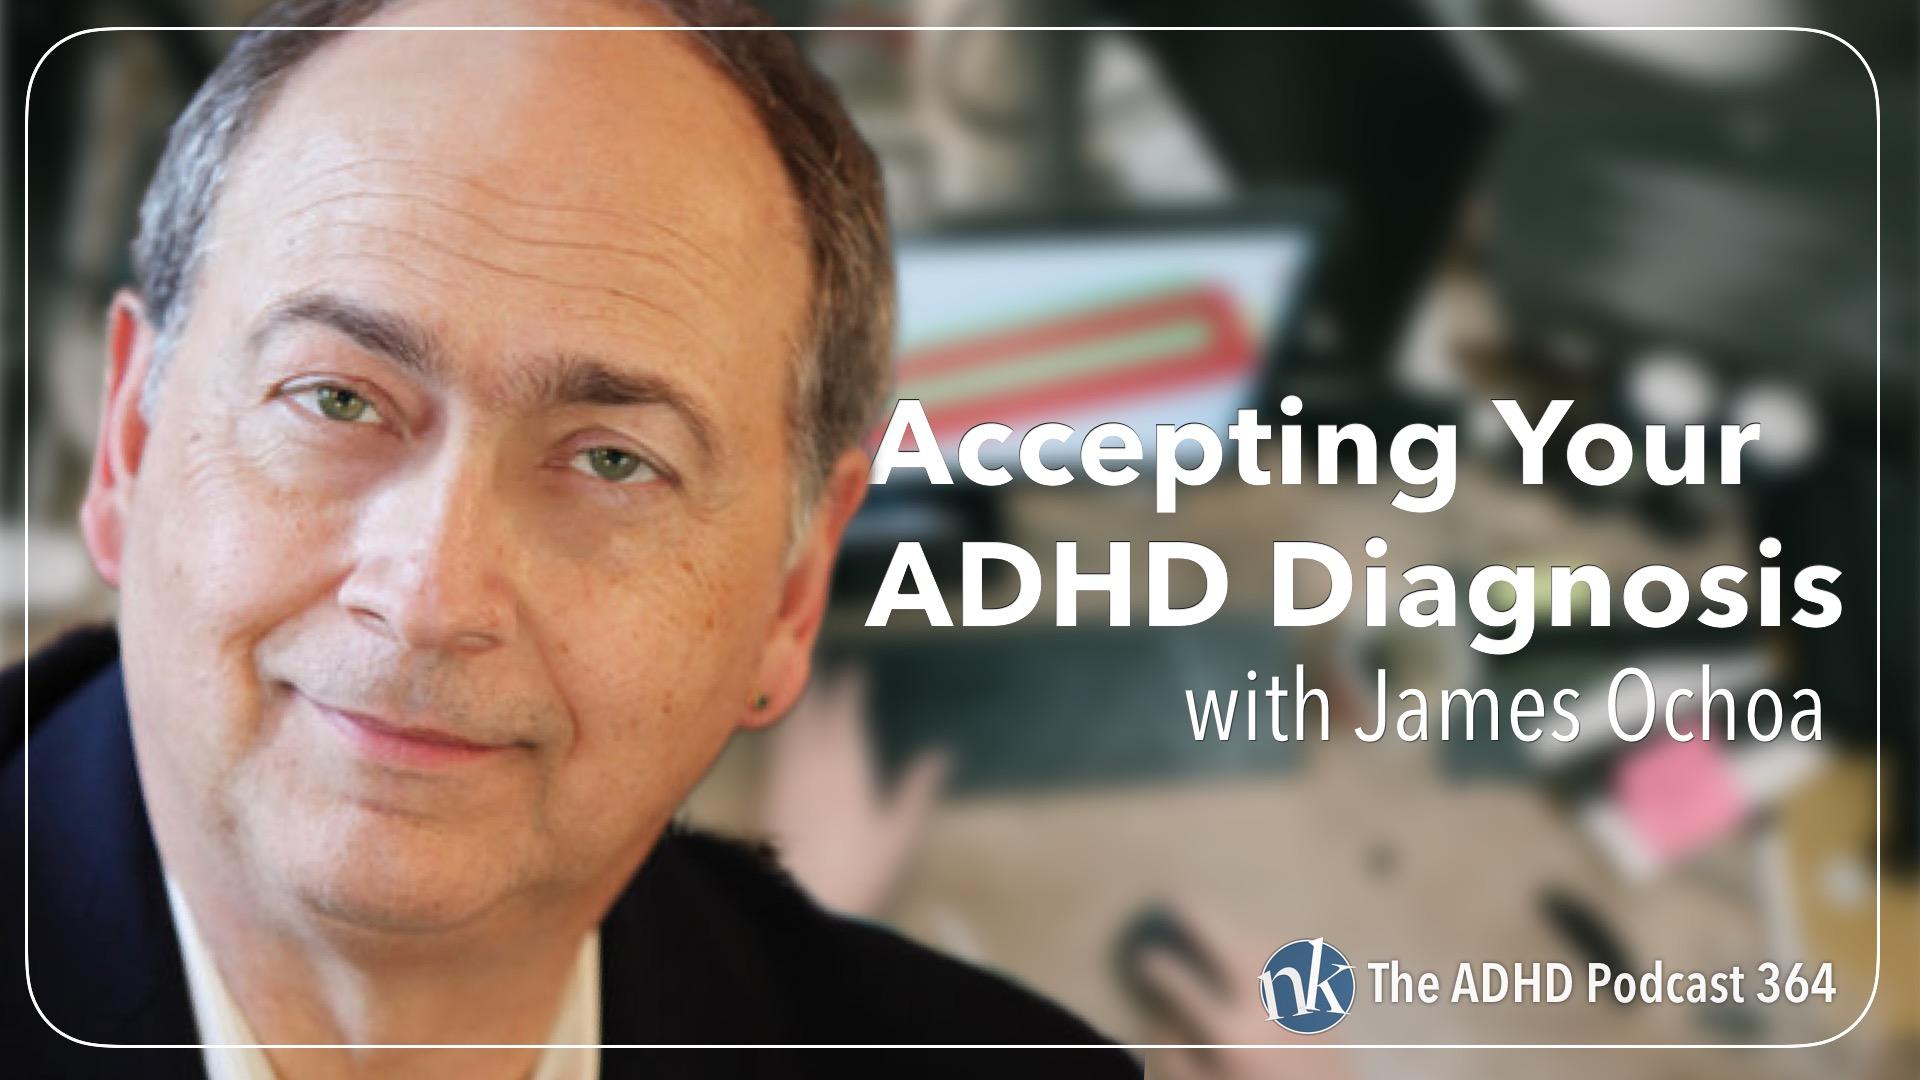 Listen to James Ochoa on The ADHD Podcast